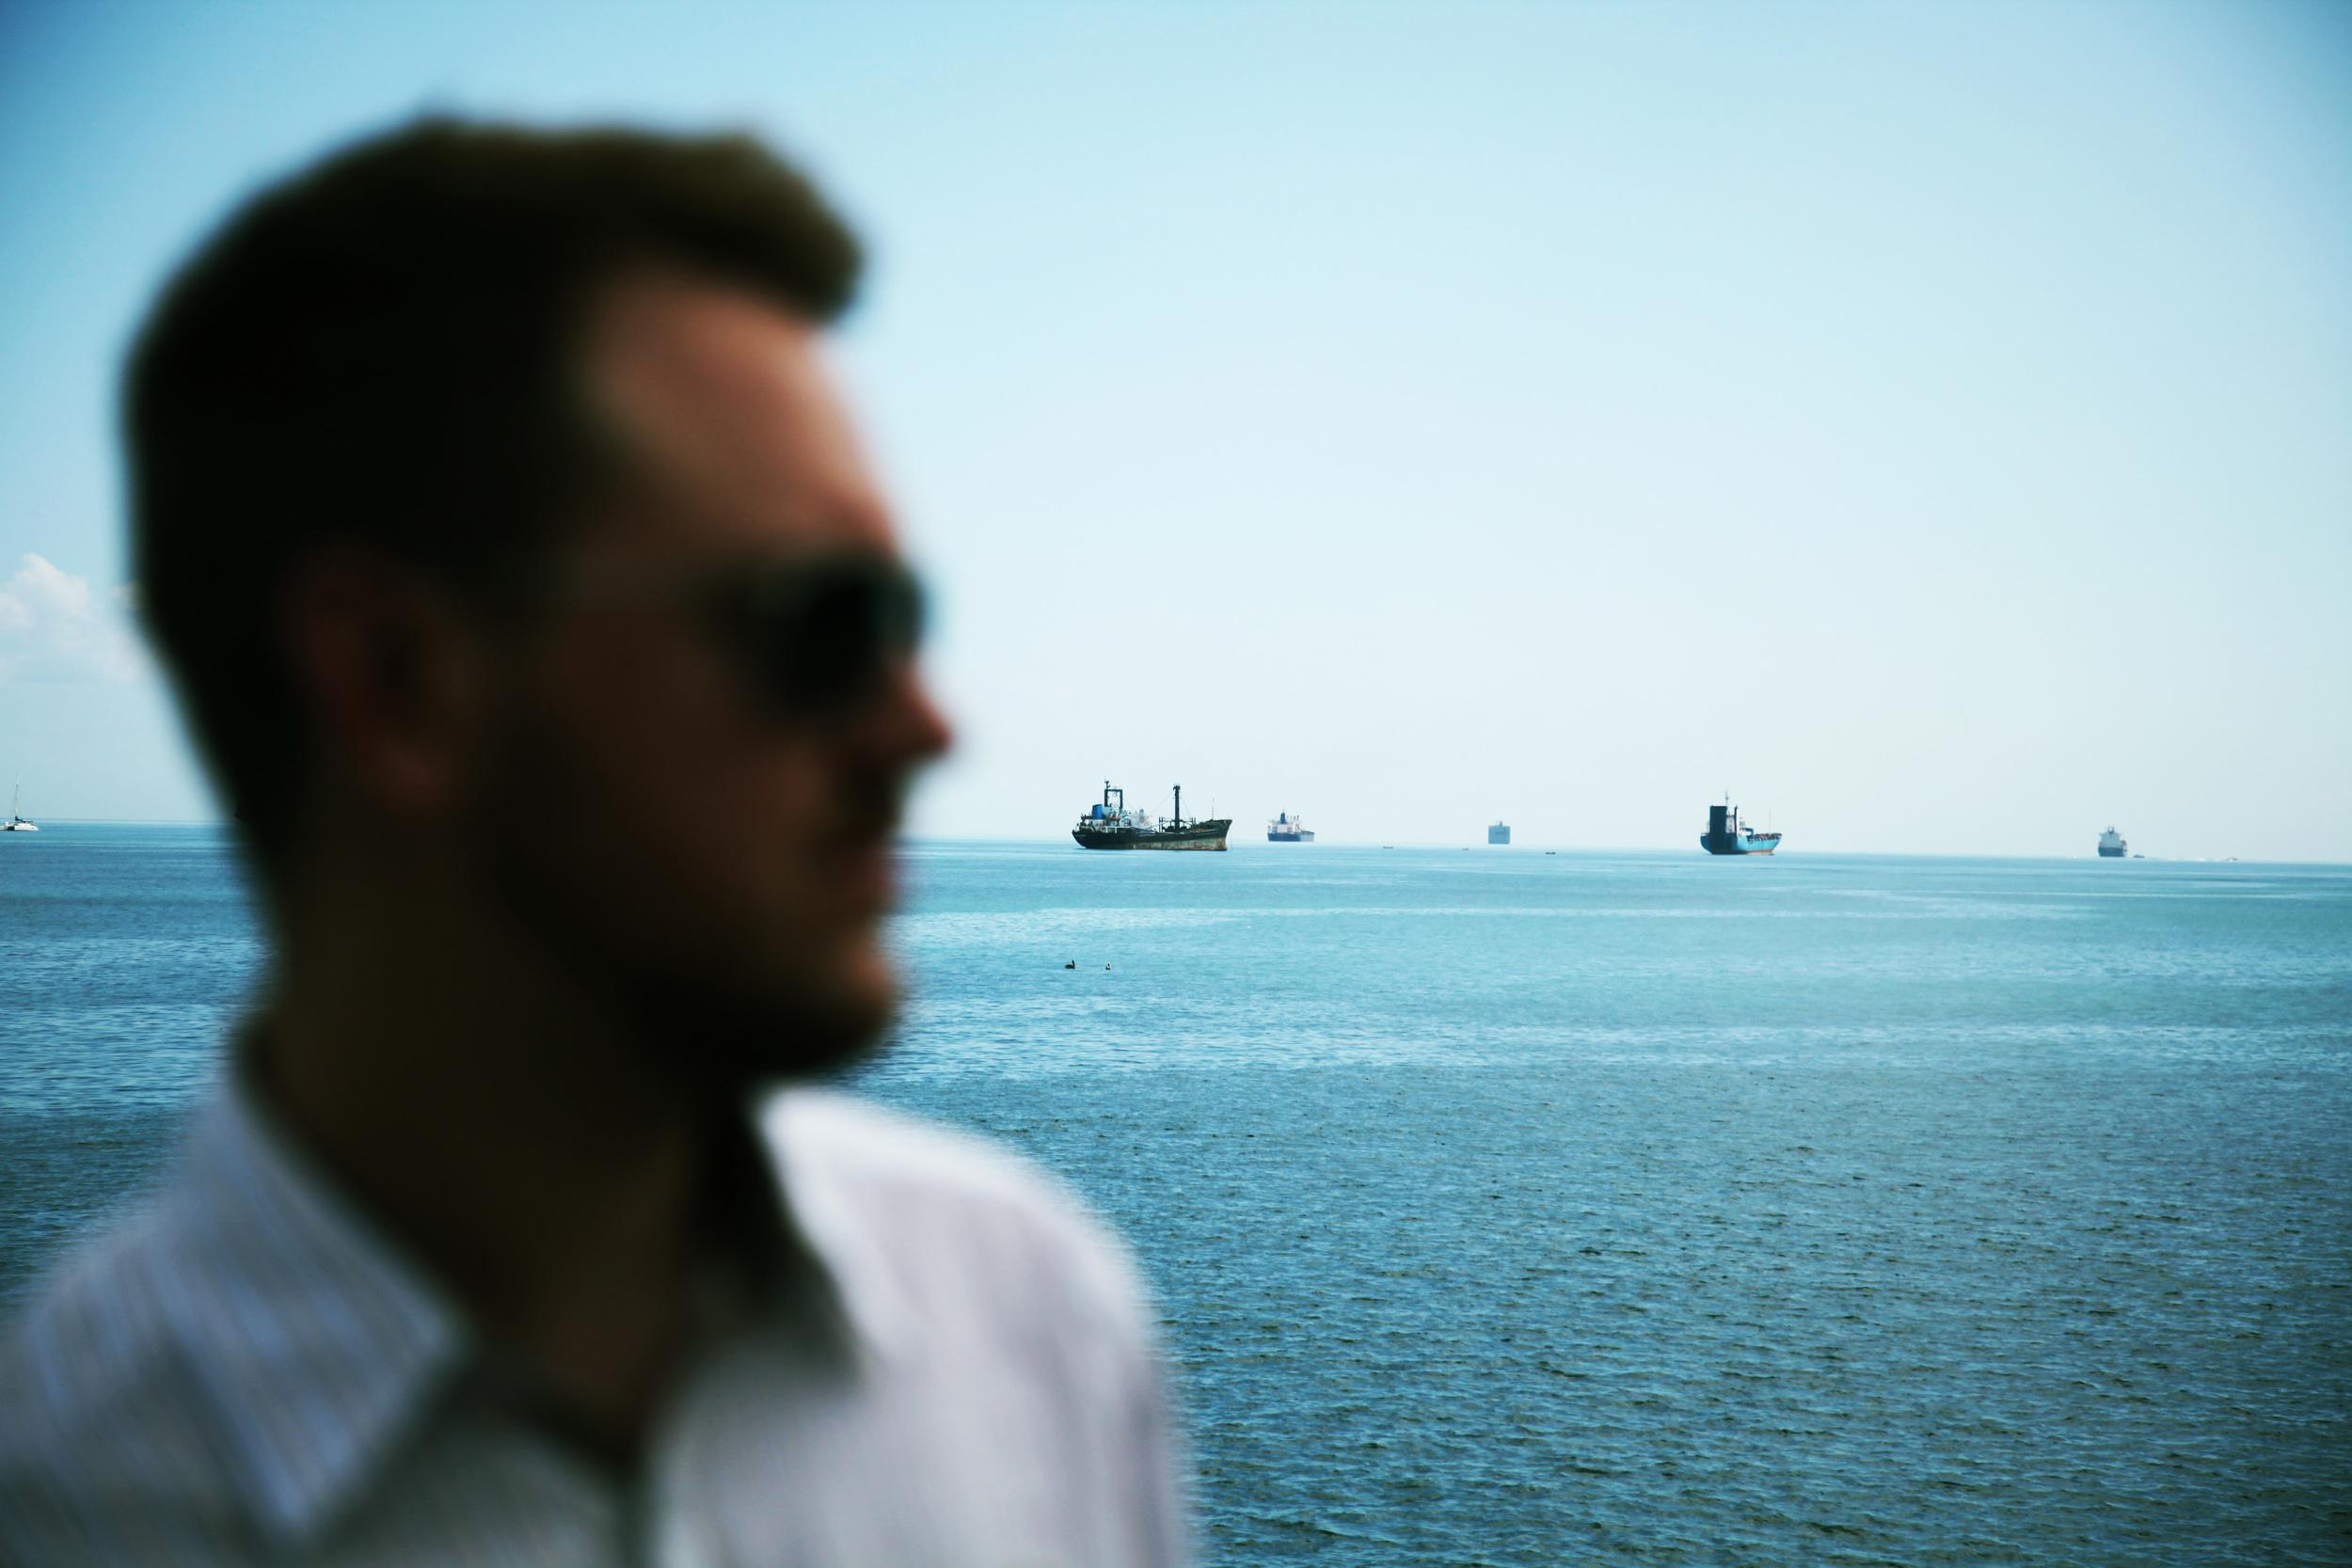 Watching ships enter the Panama Canal